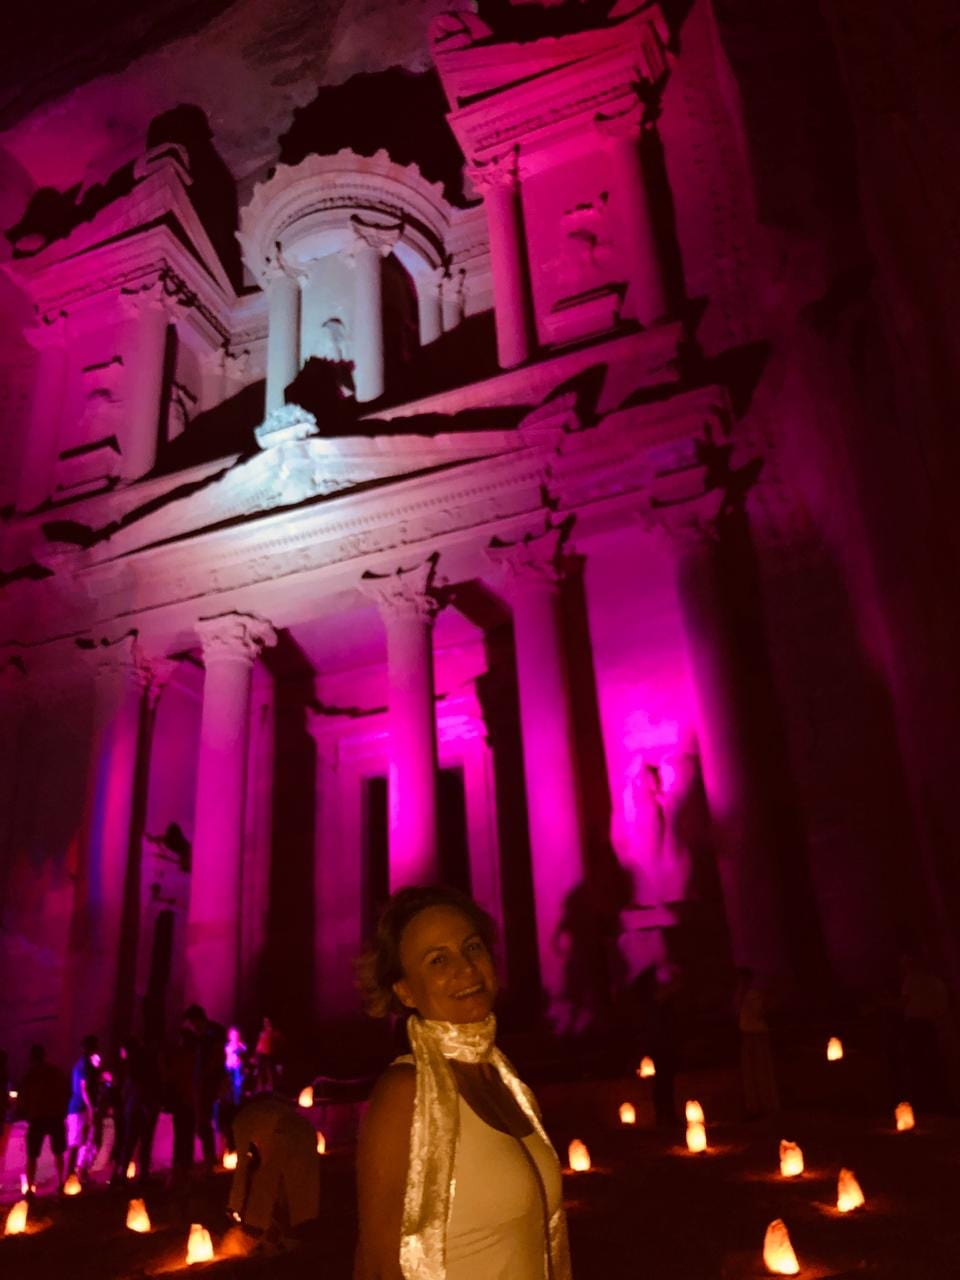 Petra by night rosa